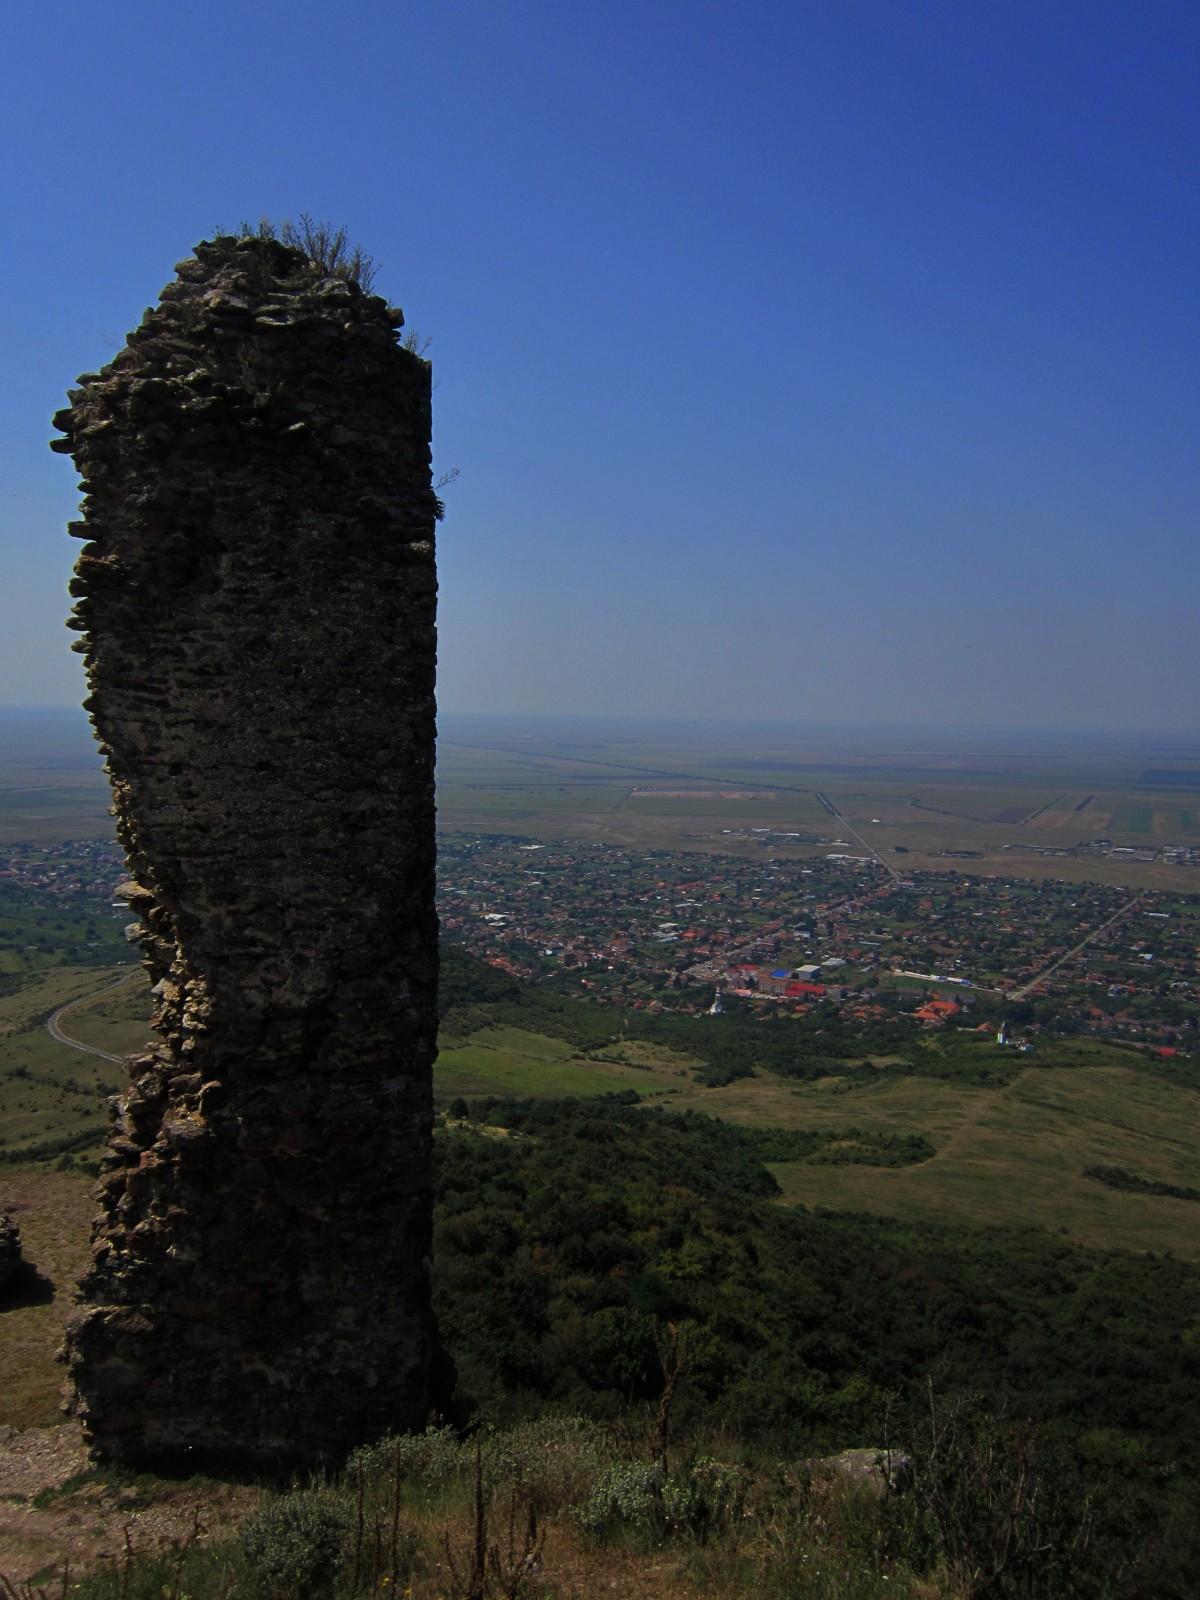 Cetatea Siria Karpaten Roemenië Vladimir de Spietser Wandelen Bergen Mountains Hongaarse Vlakte Ruïnes Avontuur Natuur